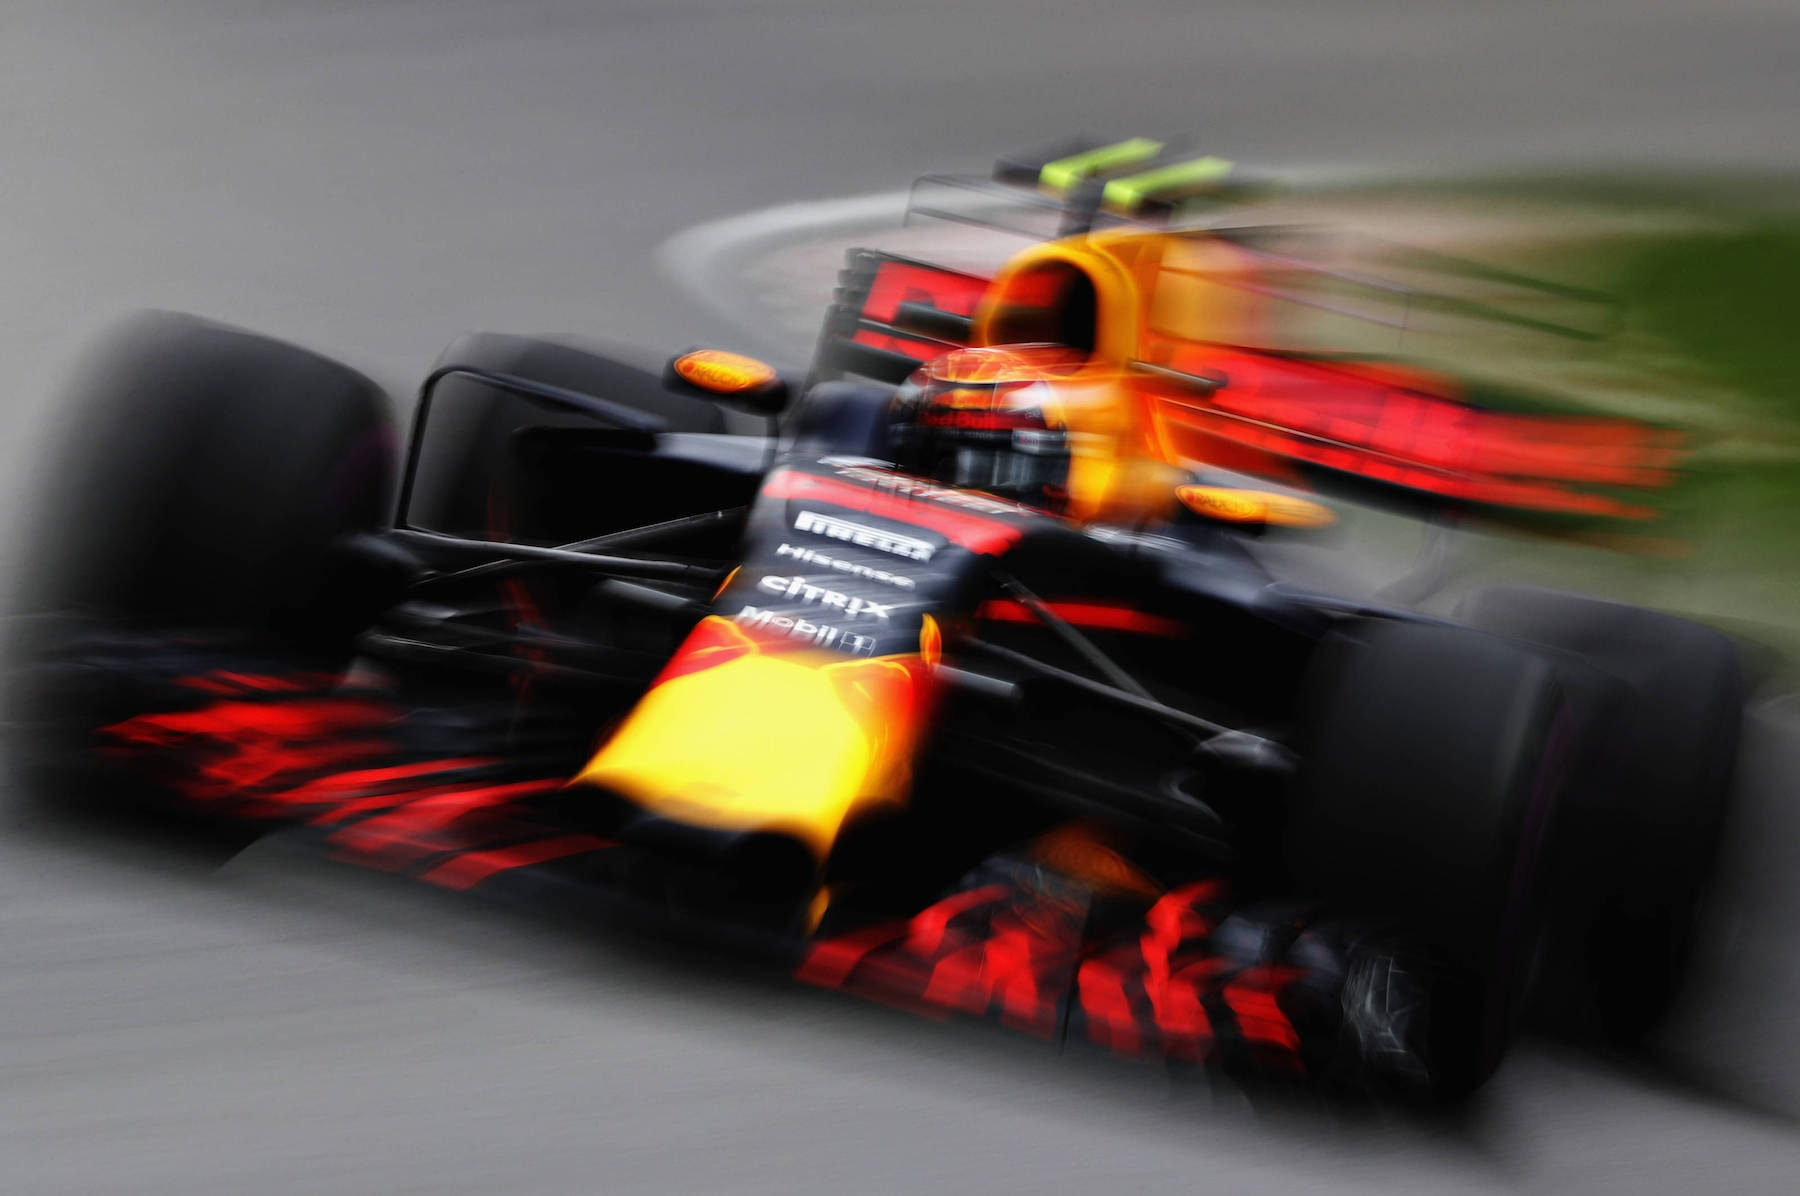 2017 Max Verstappen | Red Bull RB13 | 2017 Canadian GP FP2 1 copy.jpg